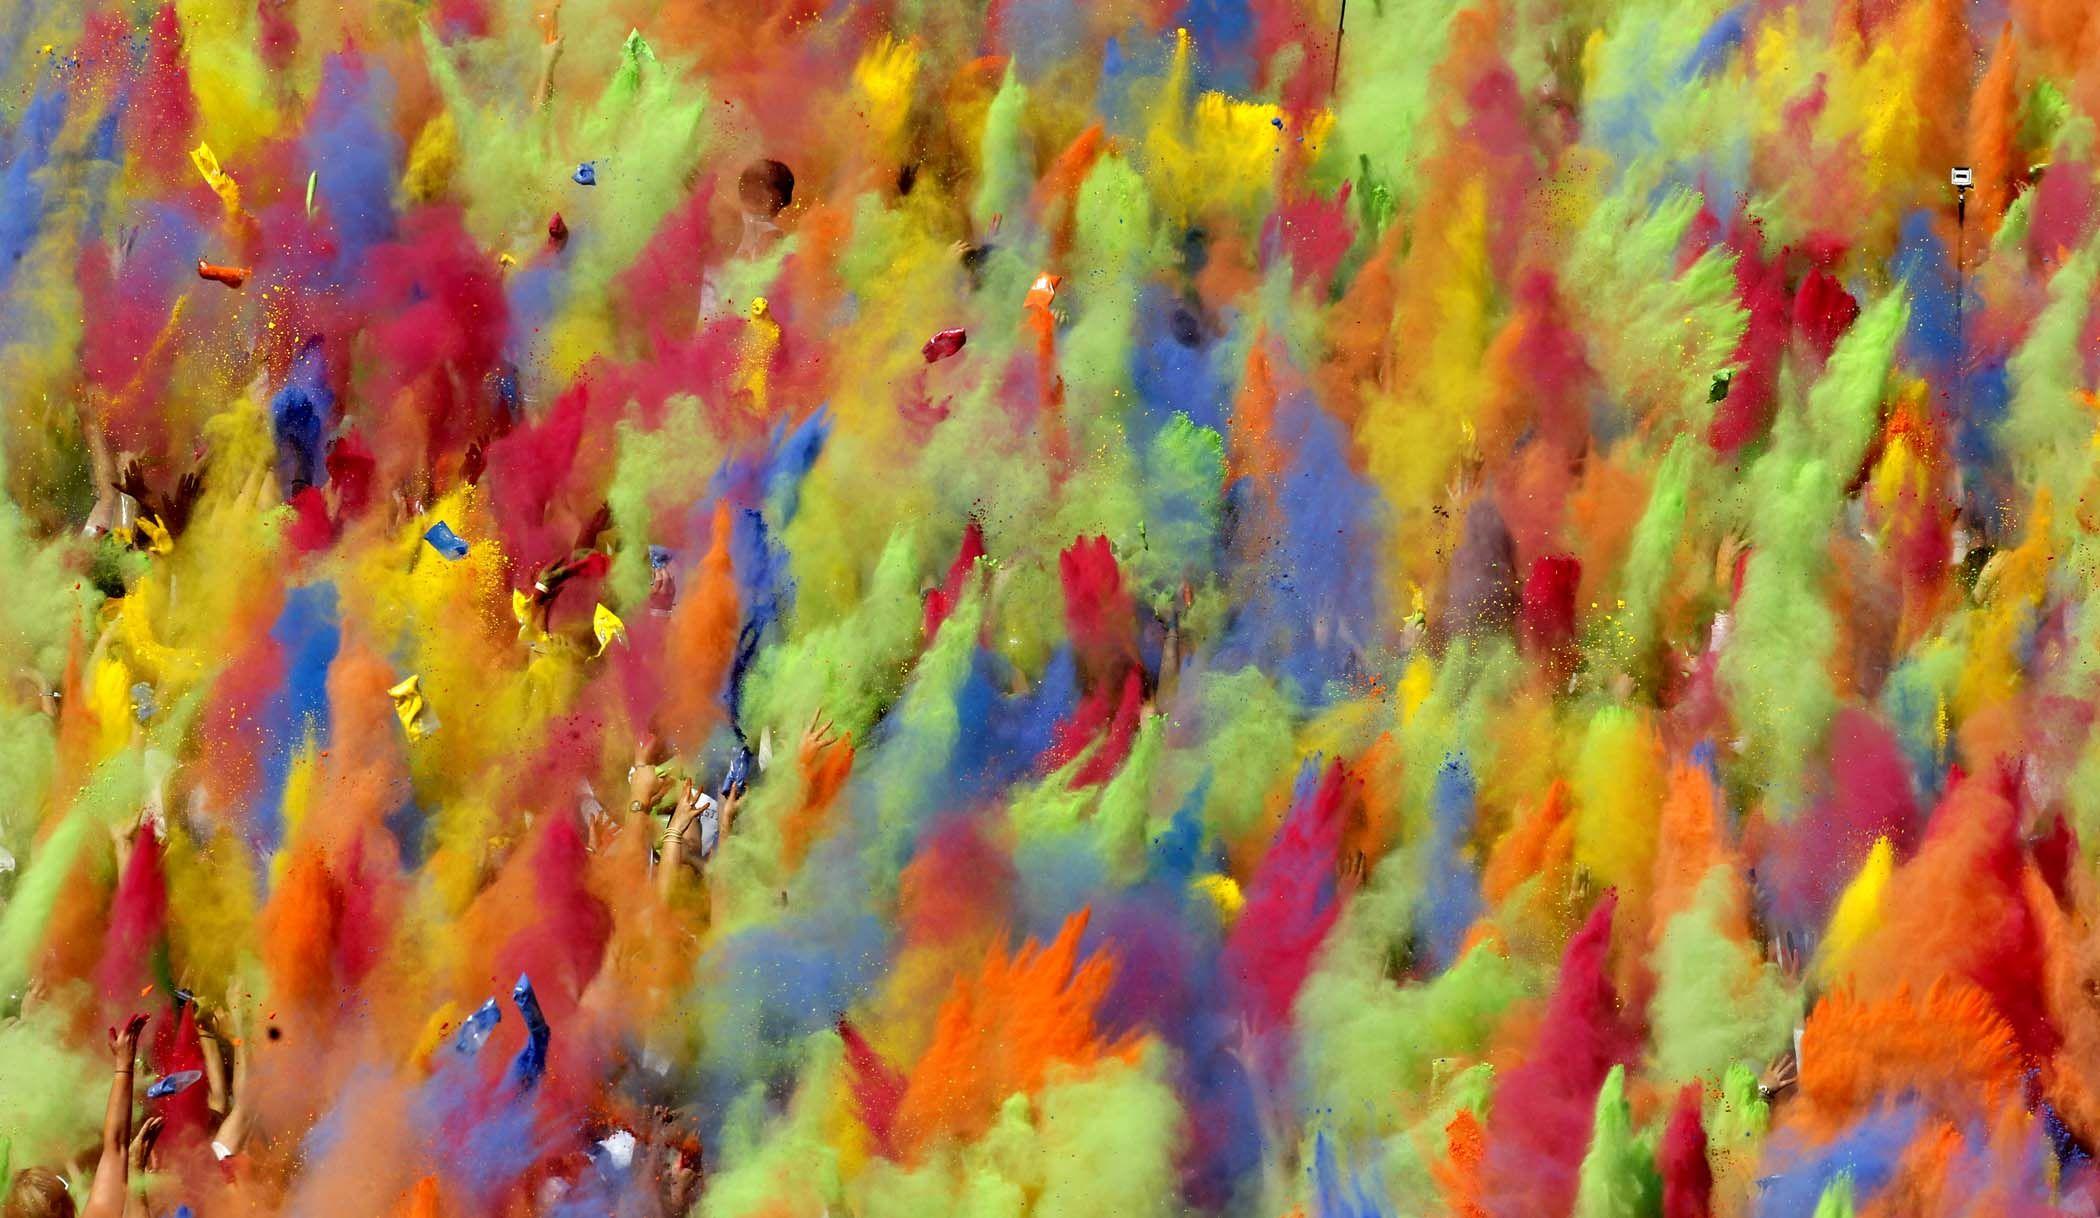 Holi Festival | Colors | Pinterest | Holi, Festivales y Google